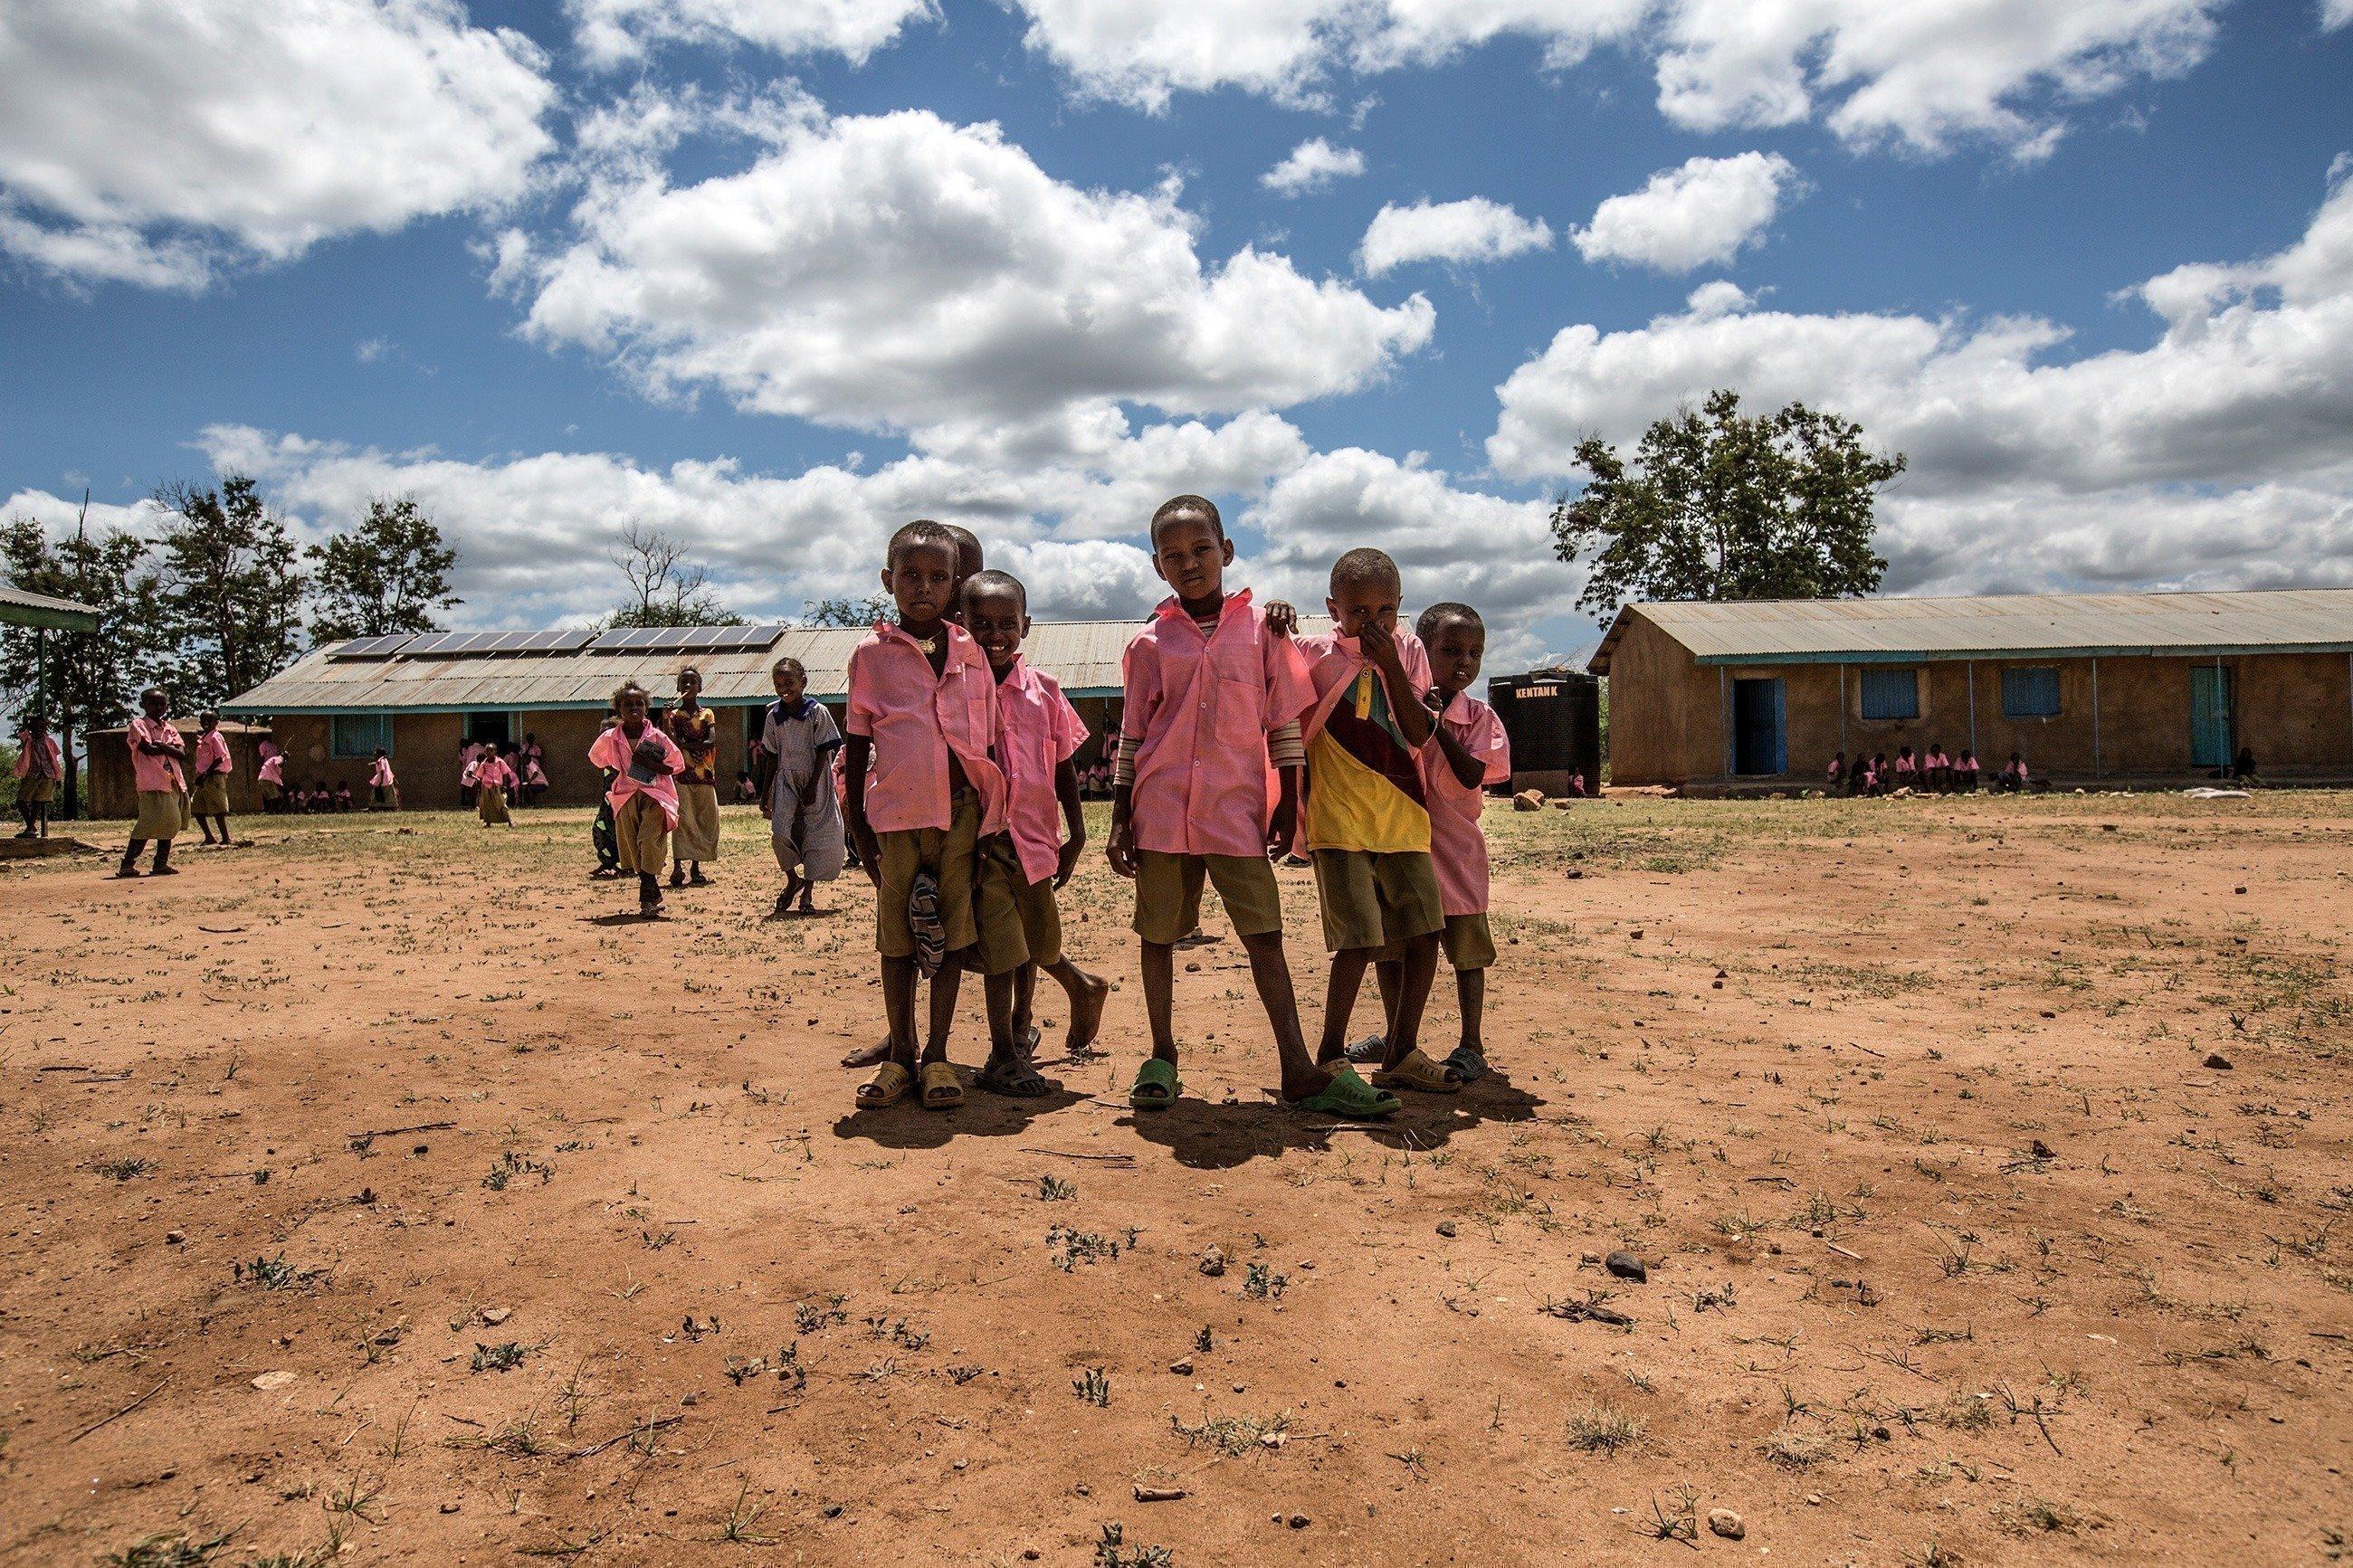 Schuljungen in rosa Hemden vor ihrer Schule.